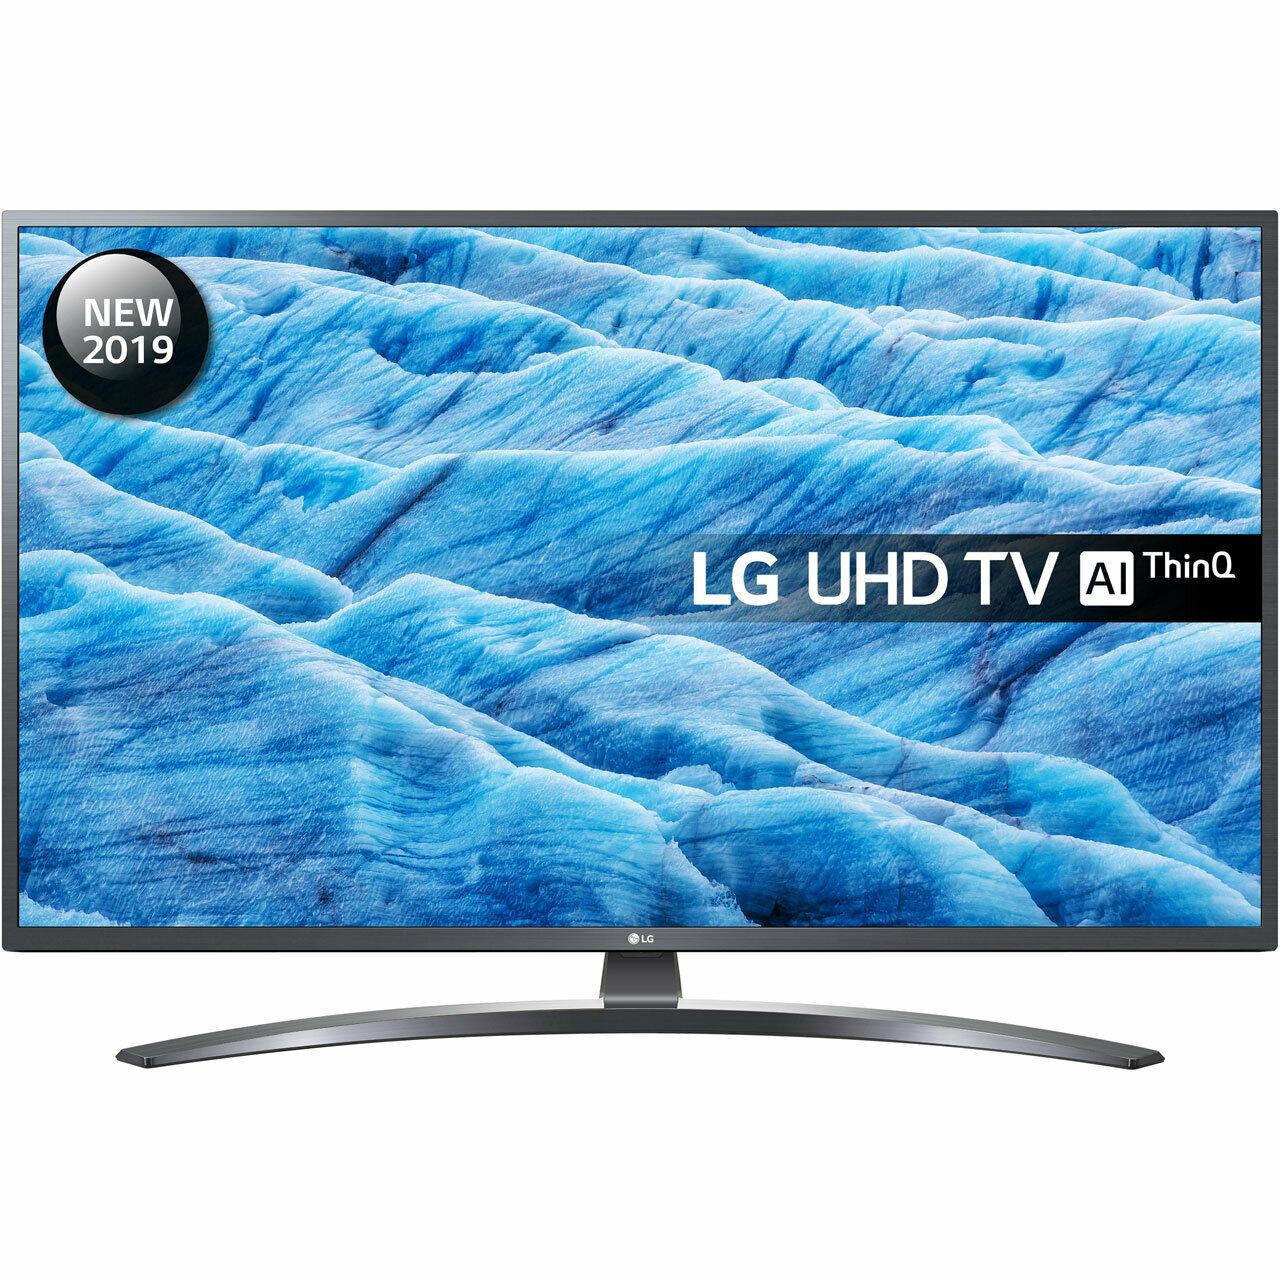 LG 49UM7400PLB UM7400 49 Inch TV Smart 4K Ultra HD LED Freeview HD and Freesat £379 @ AO eBay